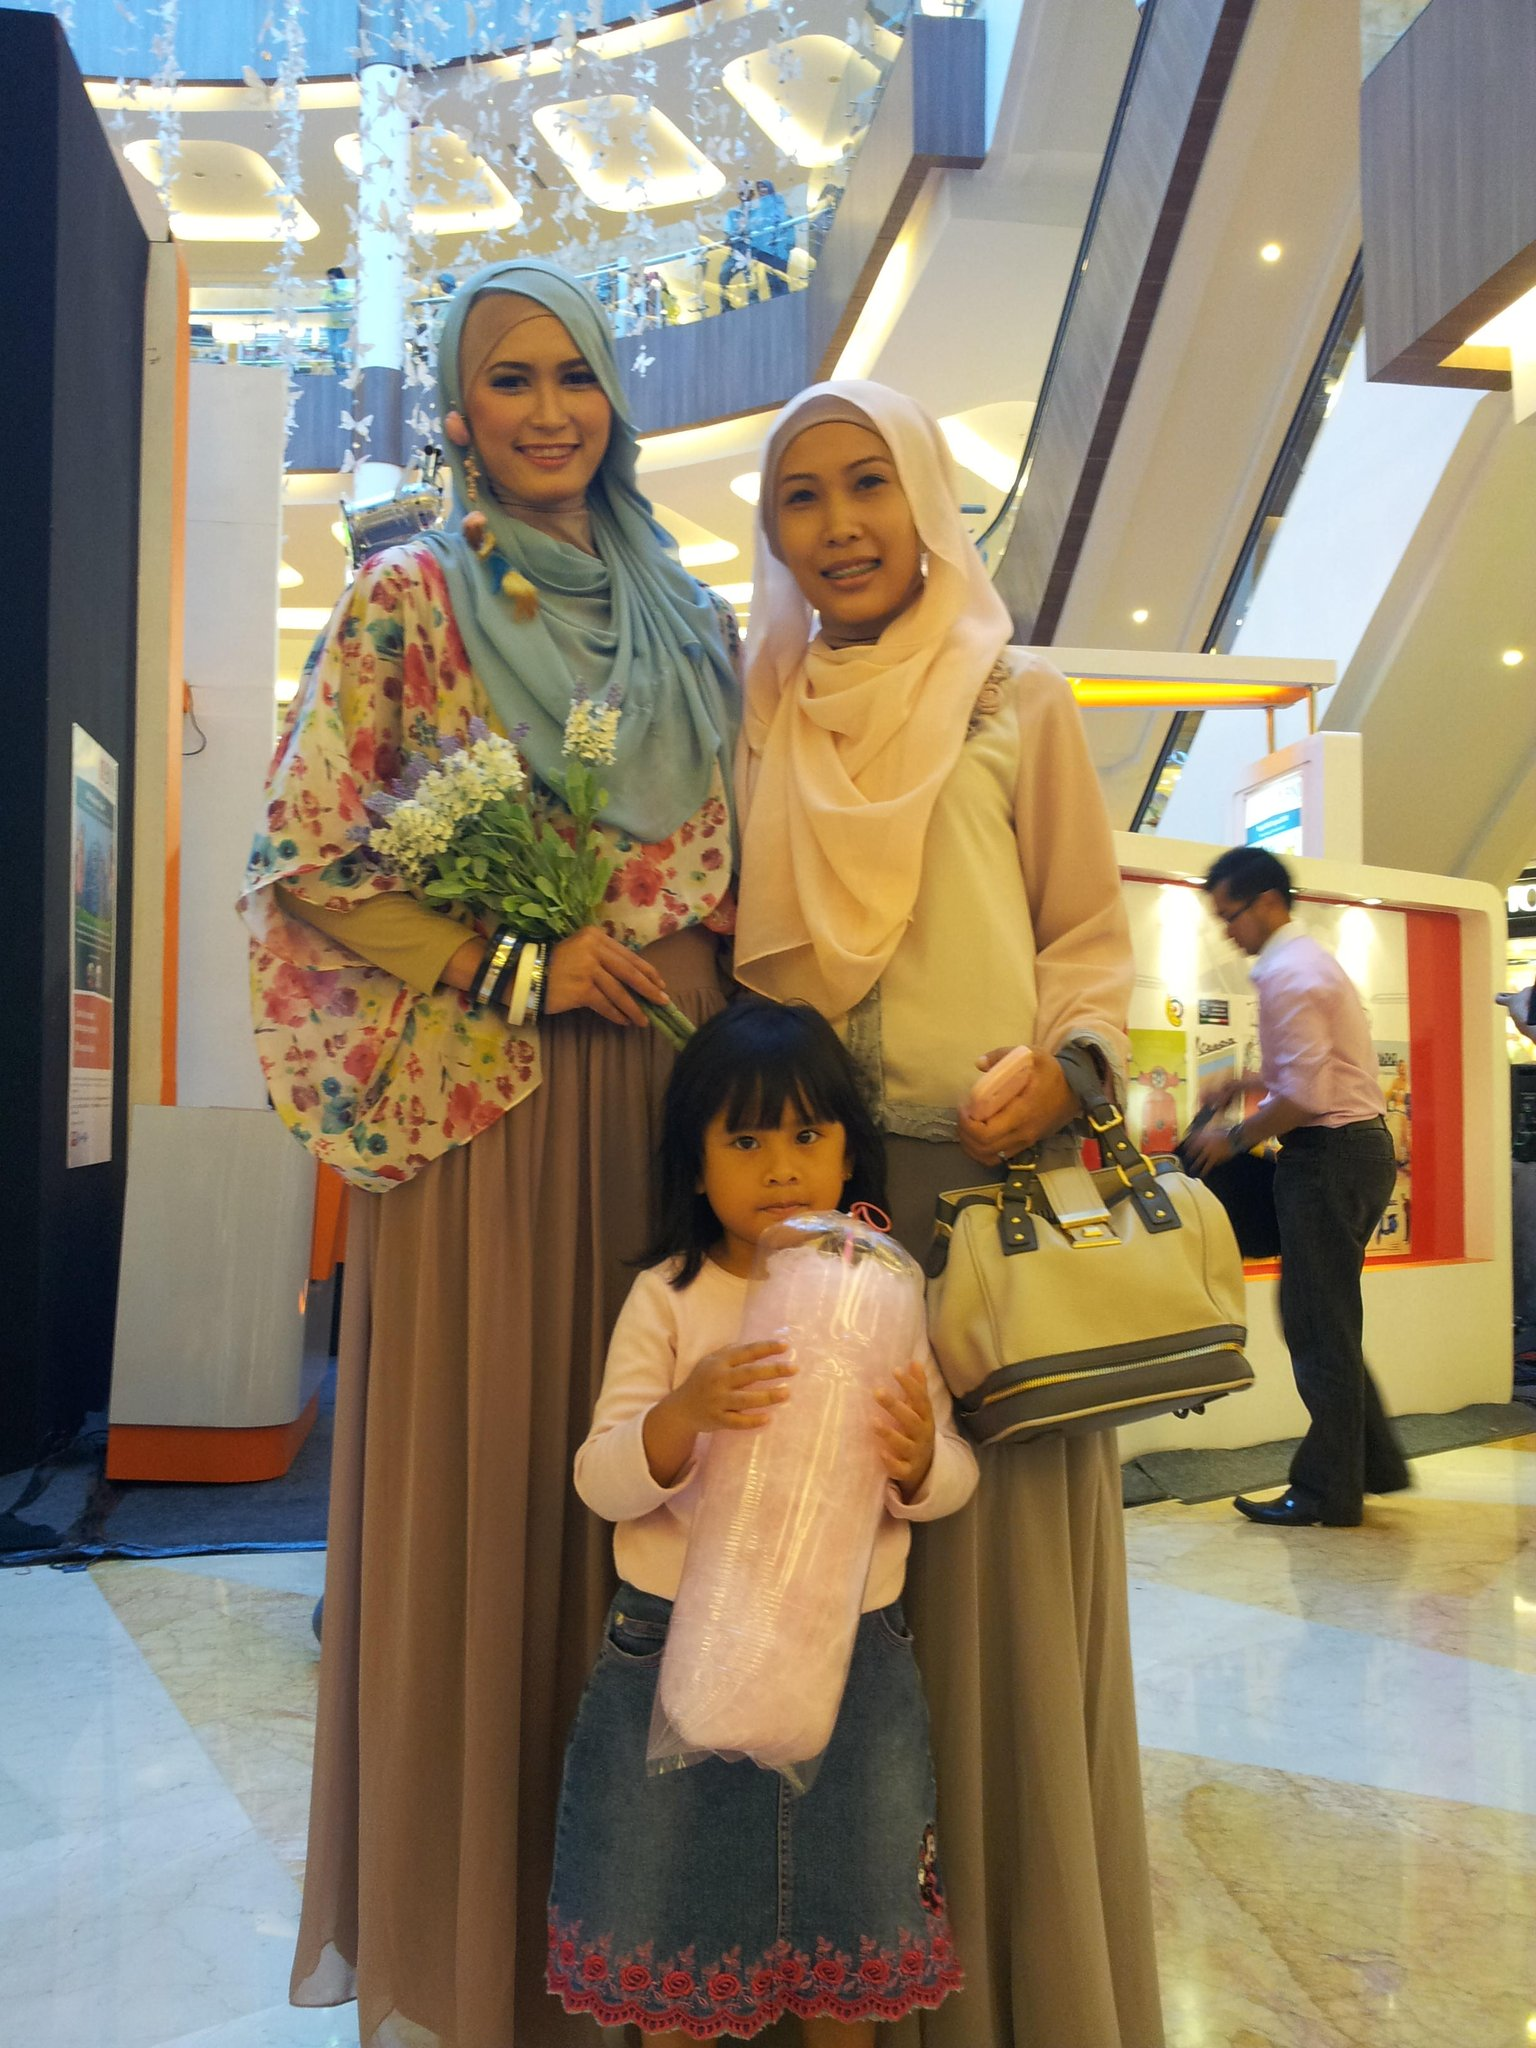 Owner indayani boutique ( @indayani_p ) n hijaber model (@Ratiihrach), di gelegar expo @BNI46 di BSM. CC: @infobandung http://t.co/jCF7gCAN